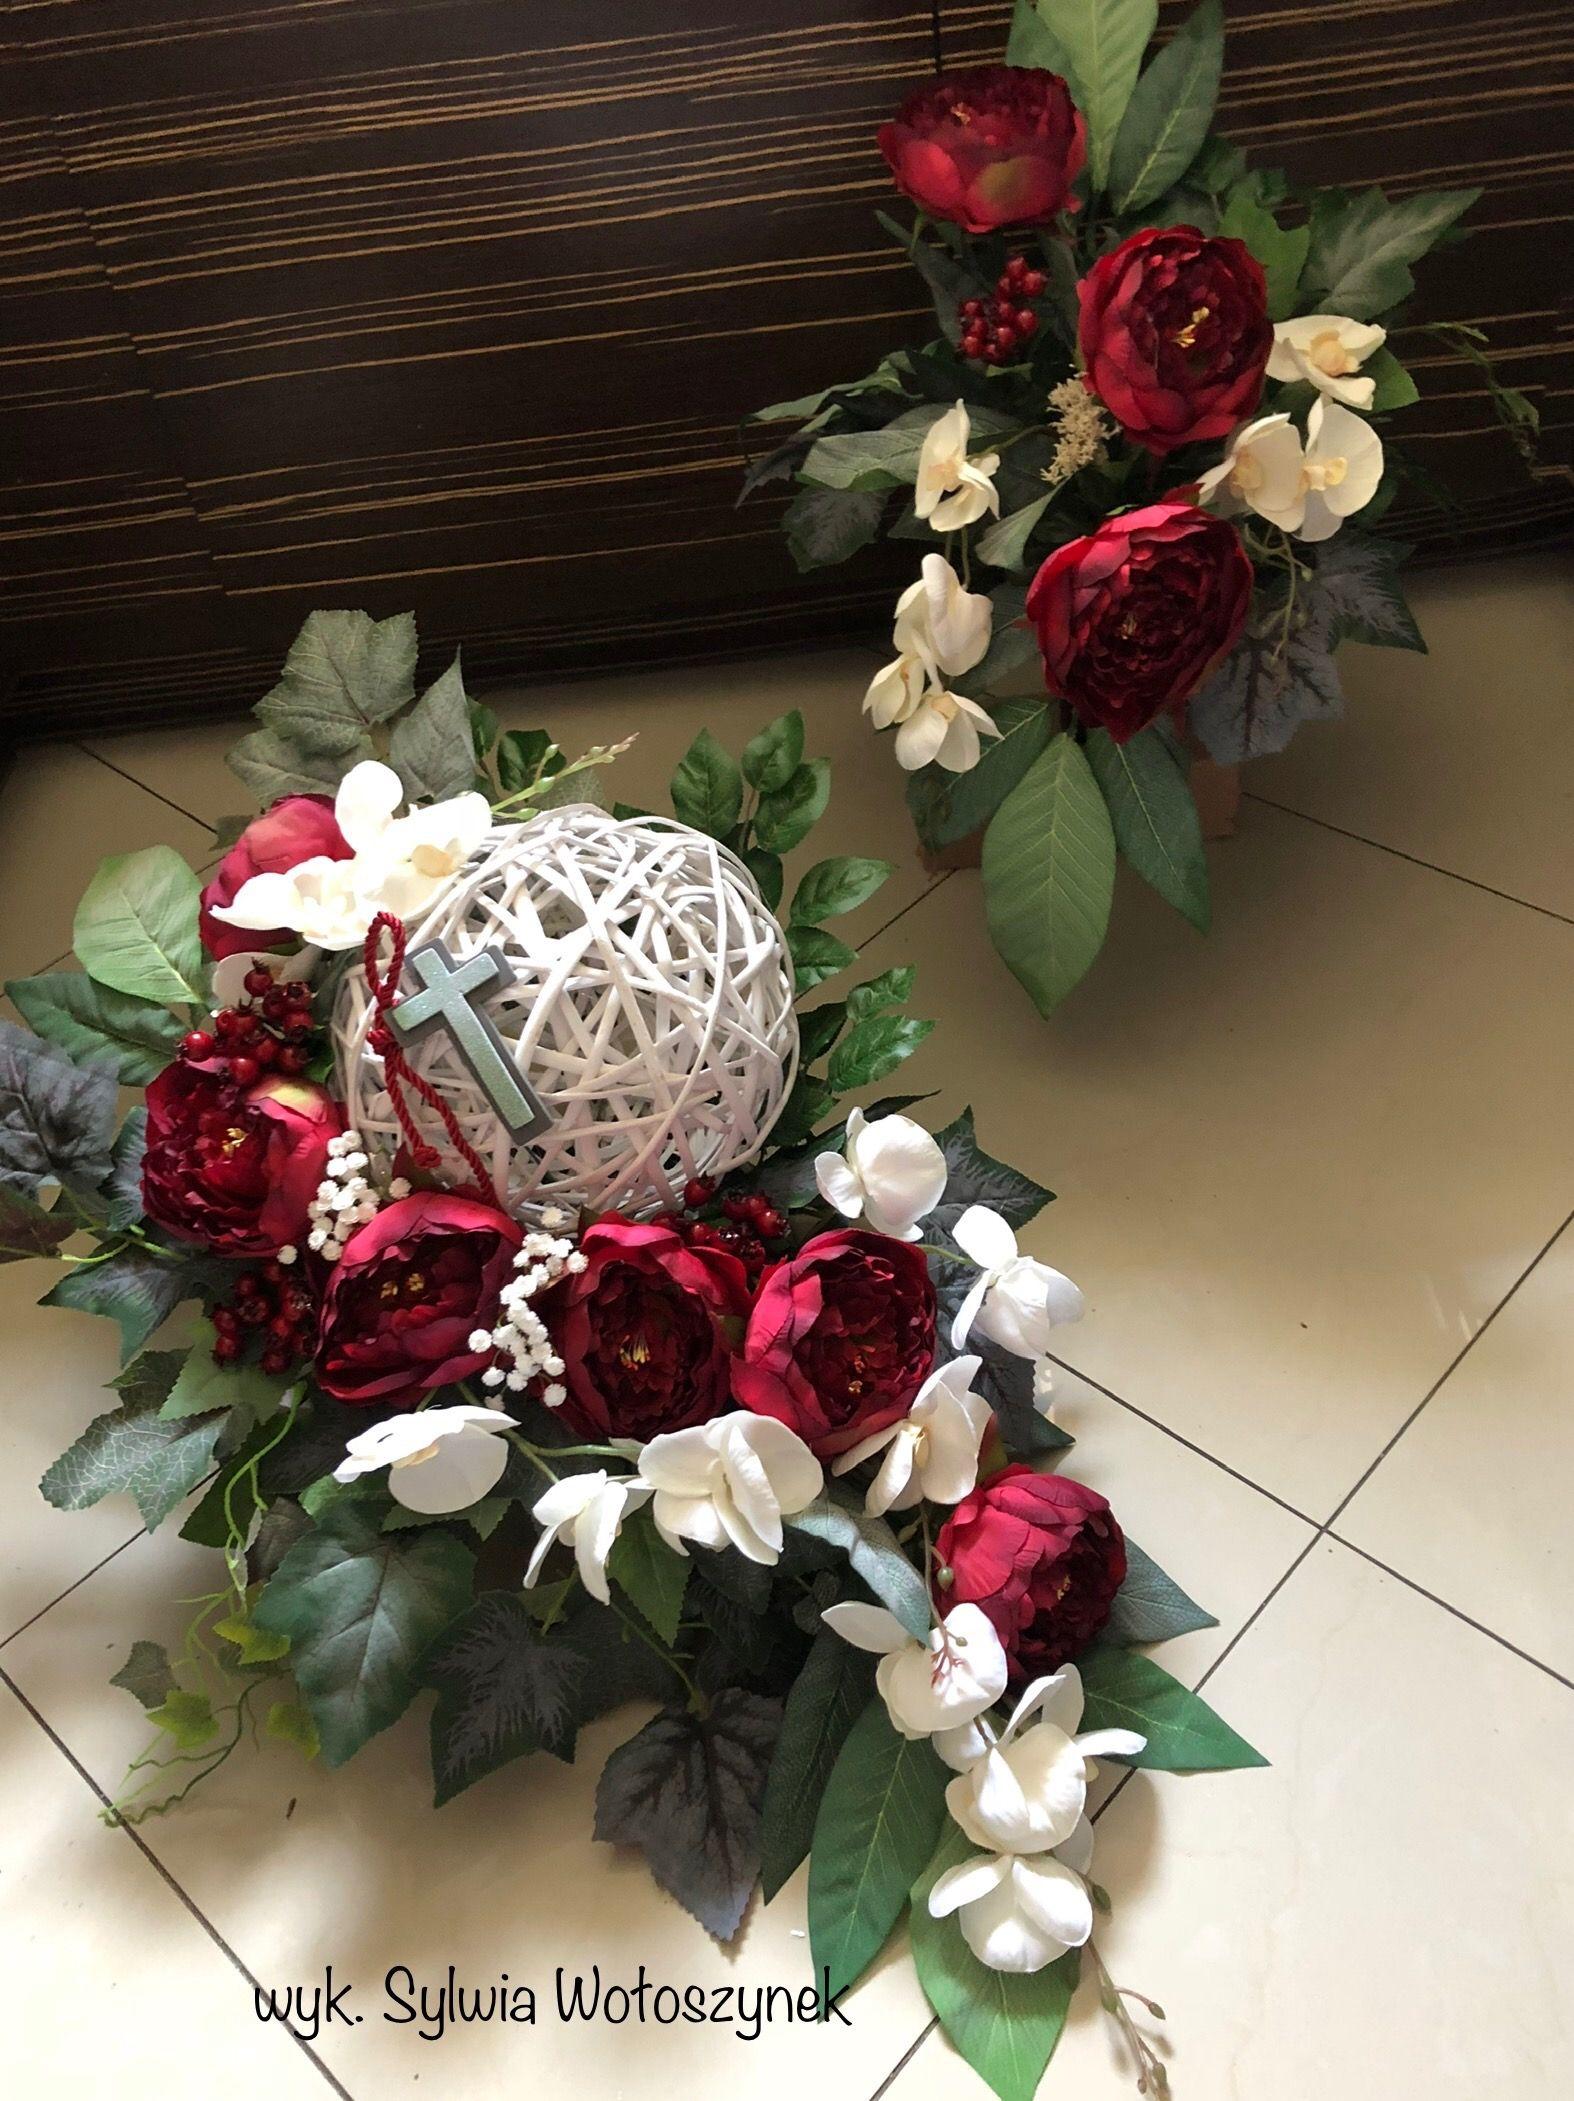 Kompozycja Nagrobna Komplet 2018 Wyk Sylwia Woloszynek Christmas Flower Arrangements Easy Holiday Decorations Flower Arrangements